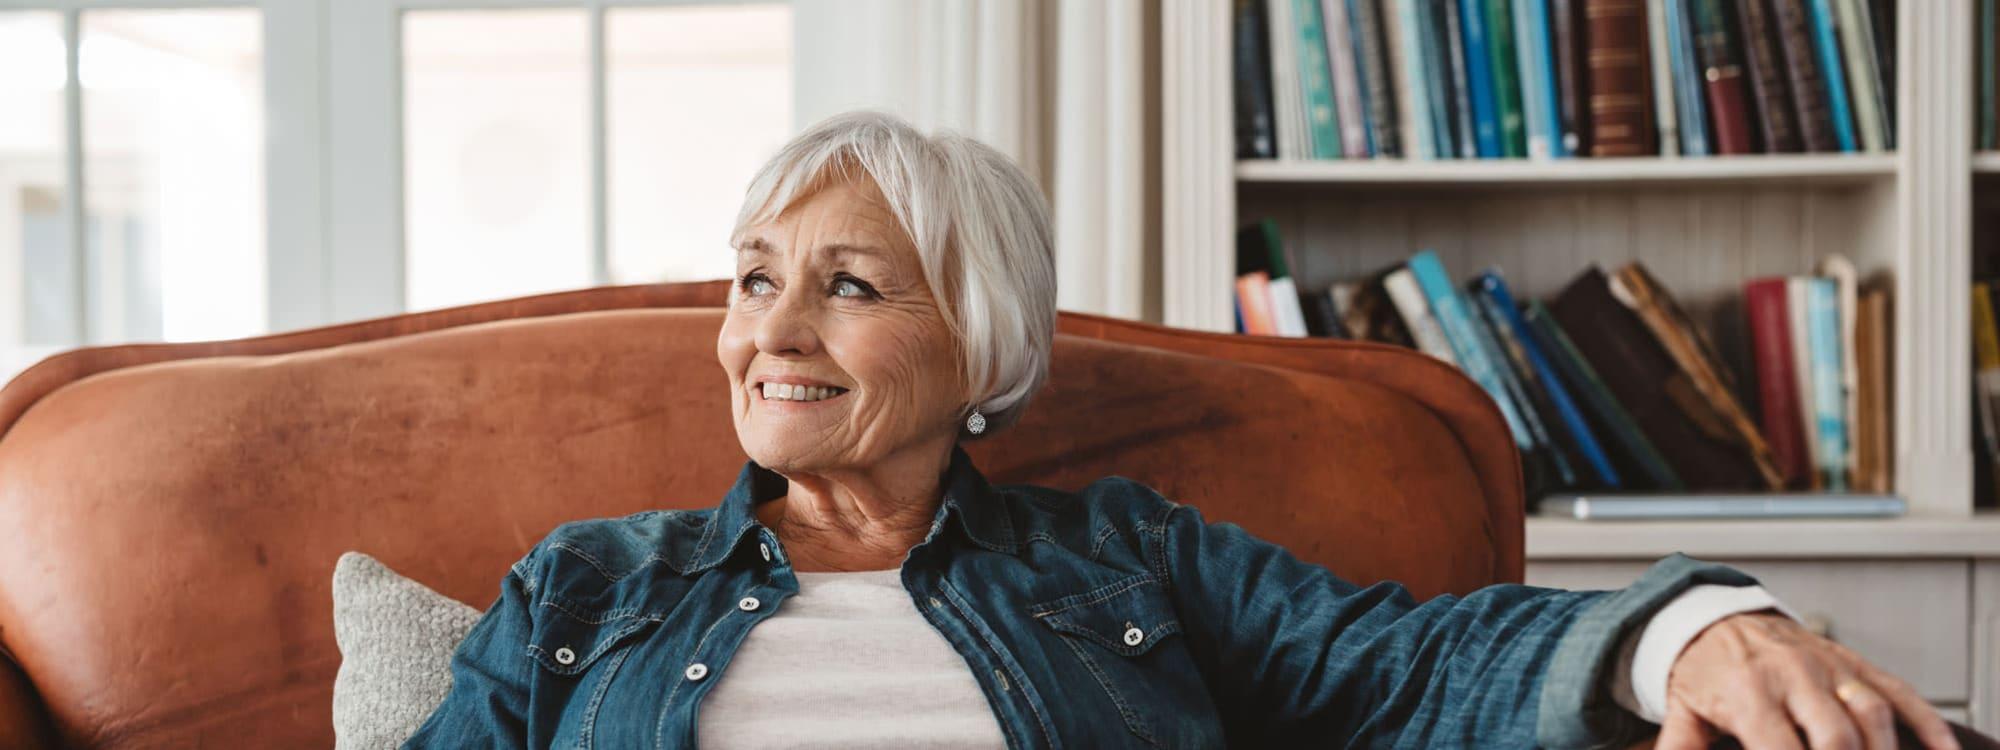 I'm Looking For - Myself at Ebenezer Senior Living